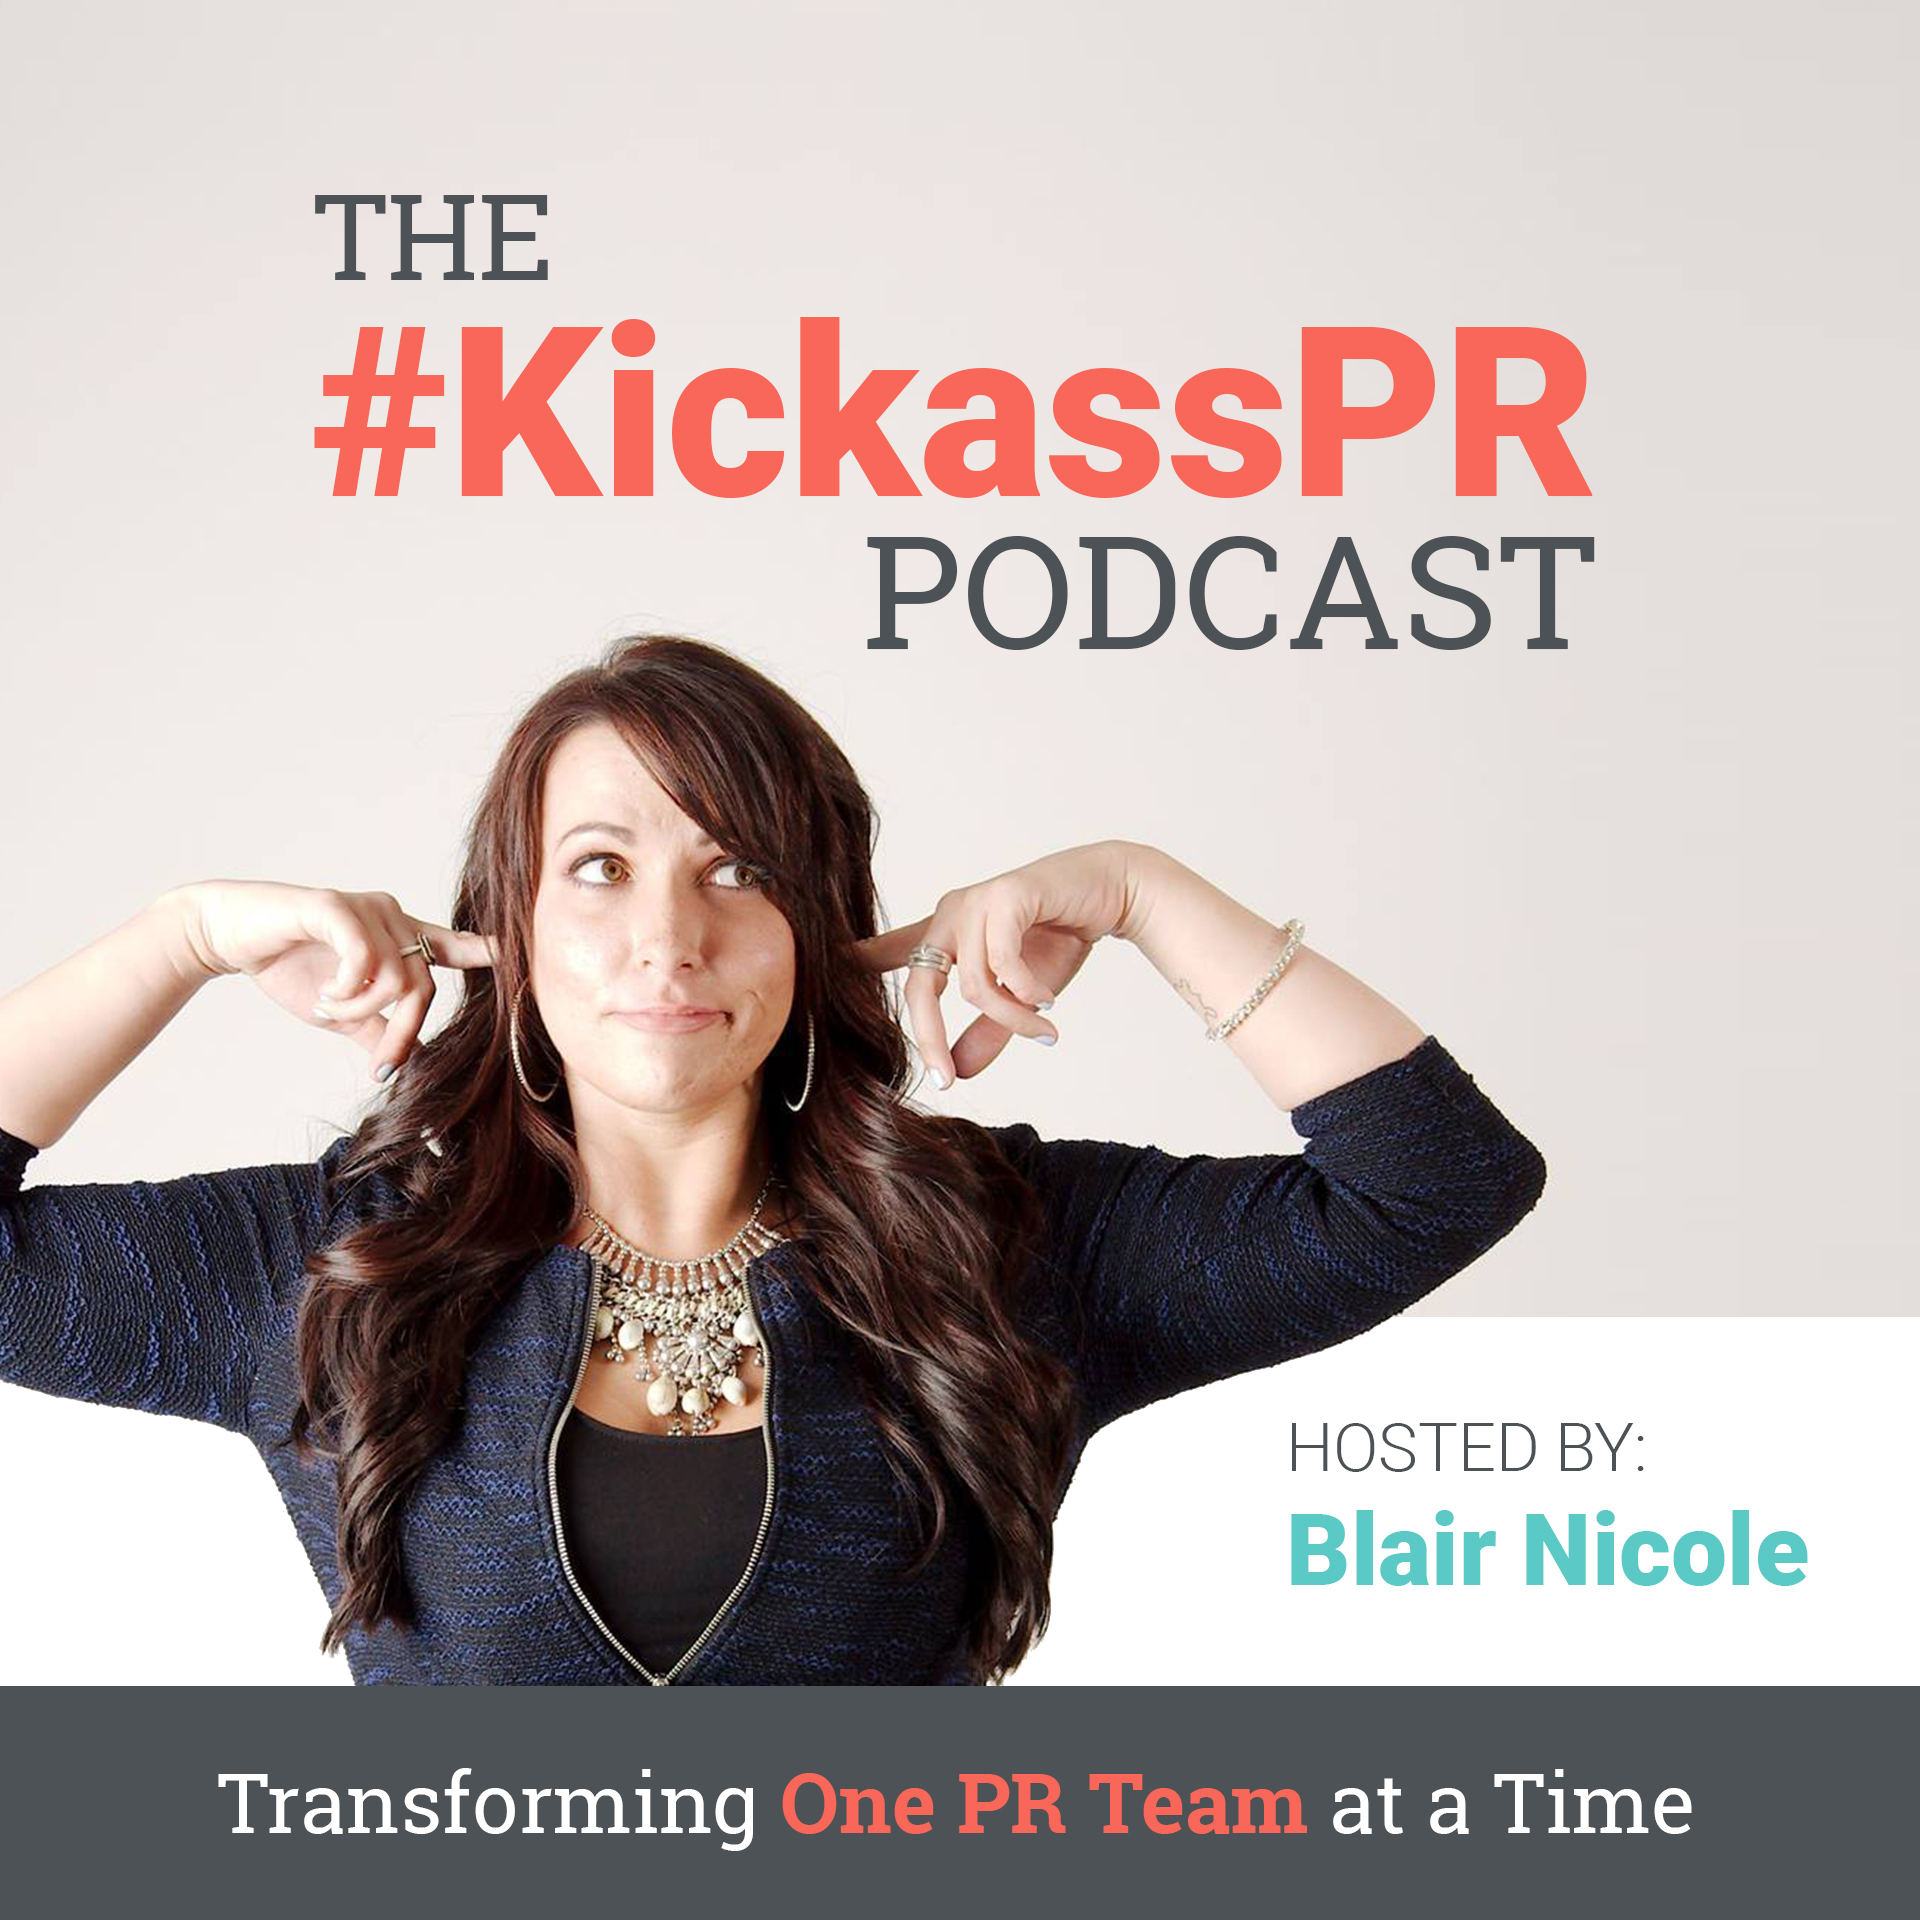 Blair Nicole Podcast